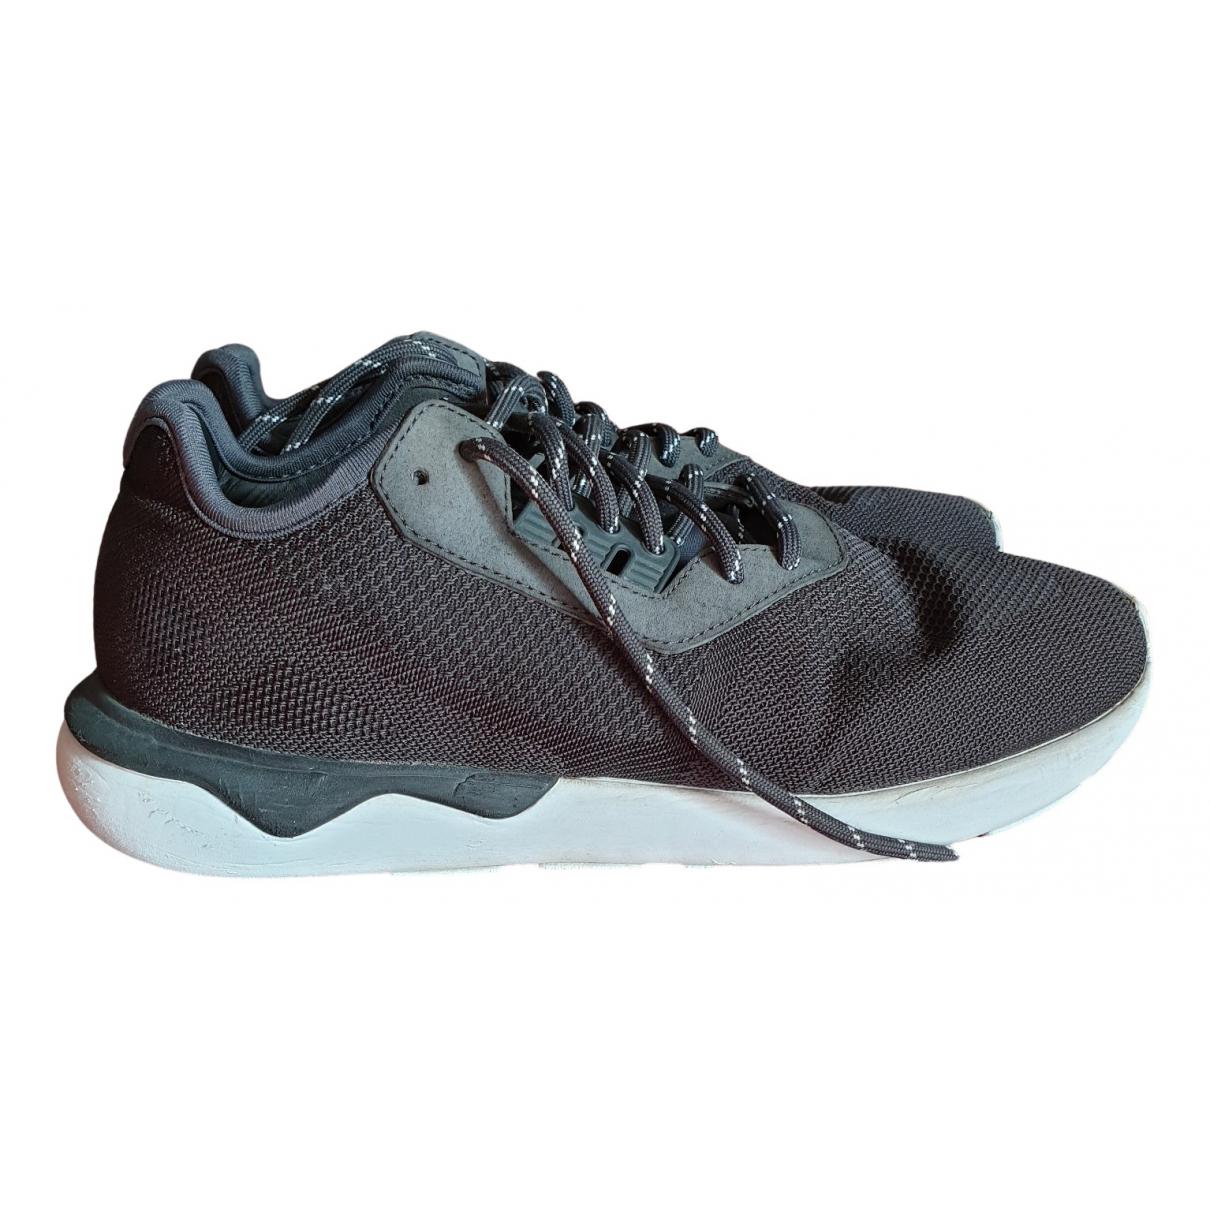 Adidas - Baskets Tubular pour homme - anthracite